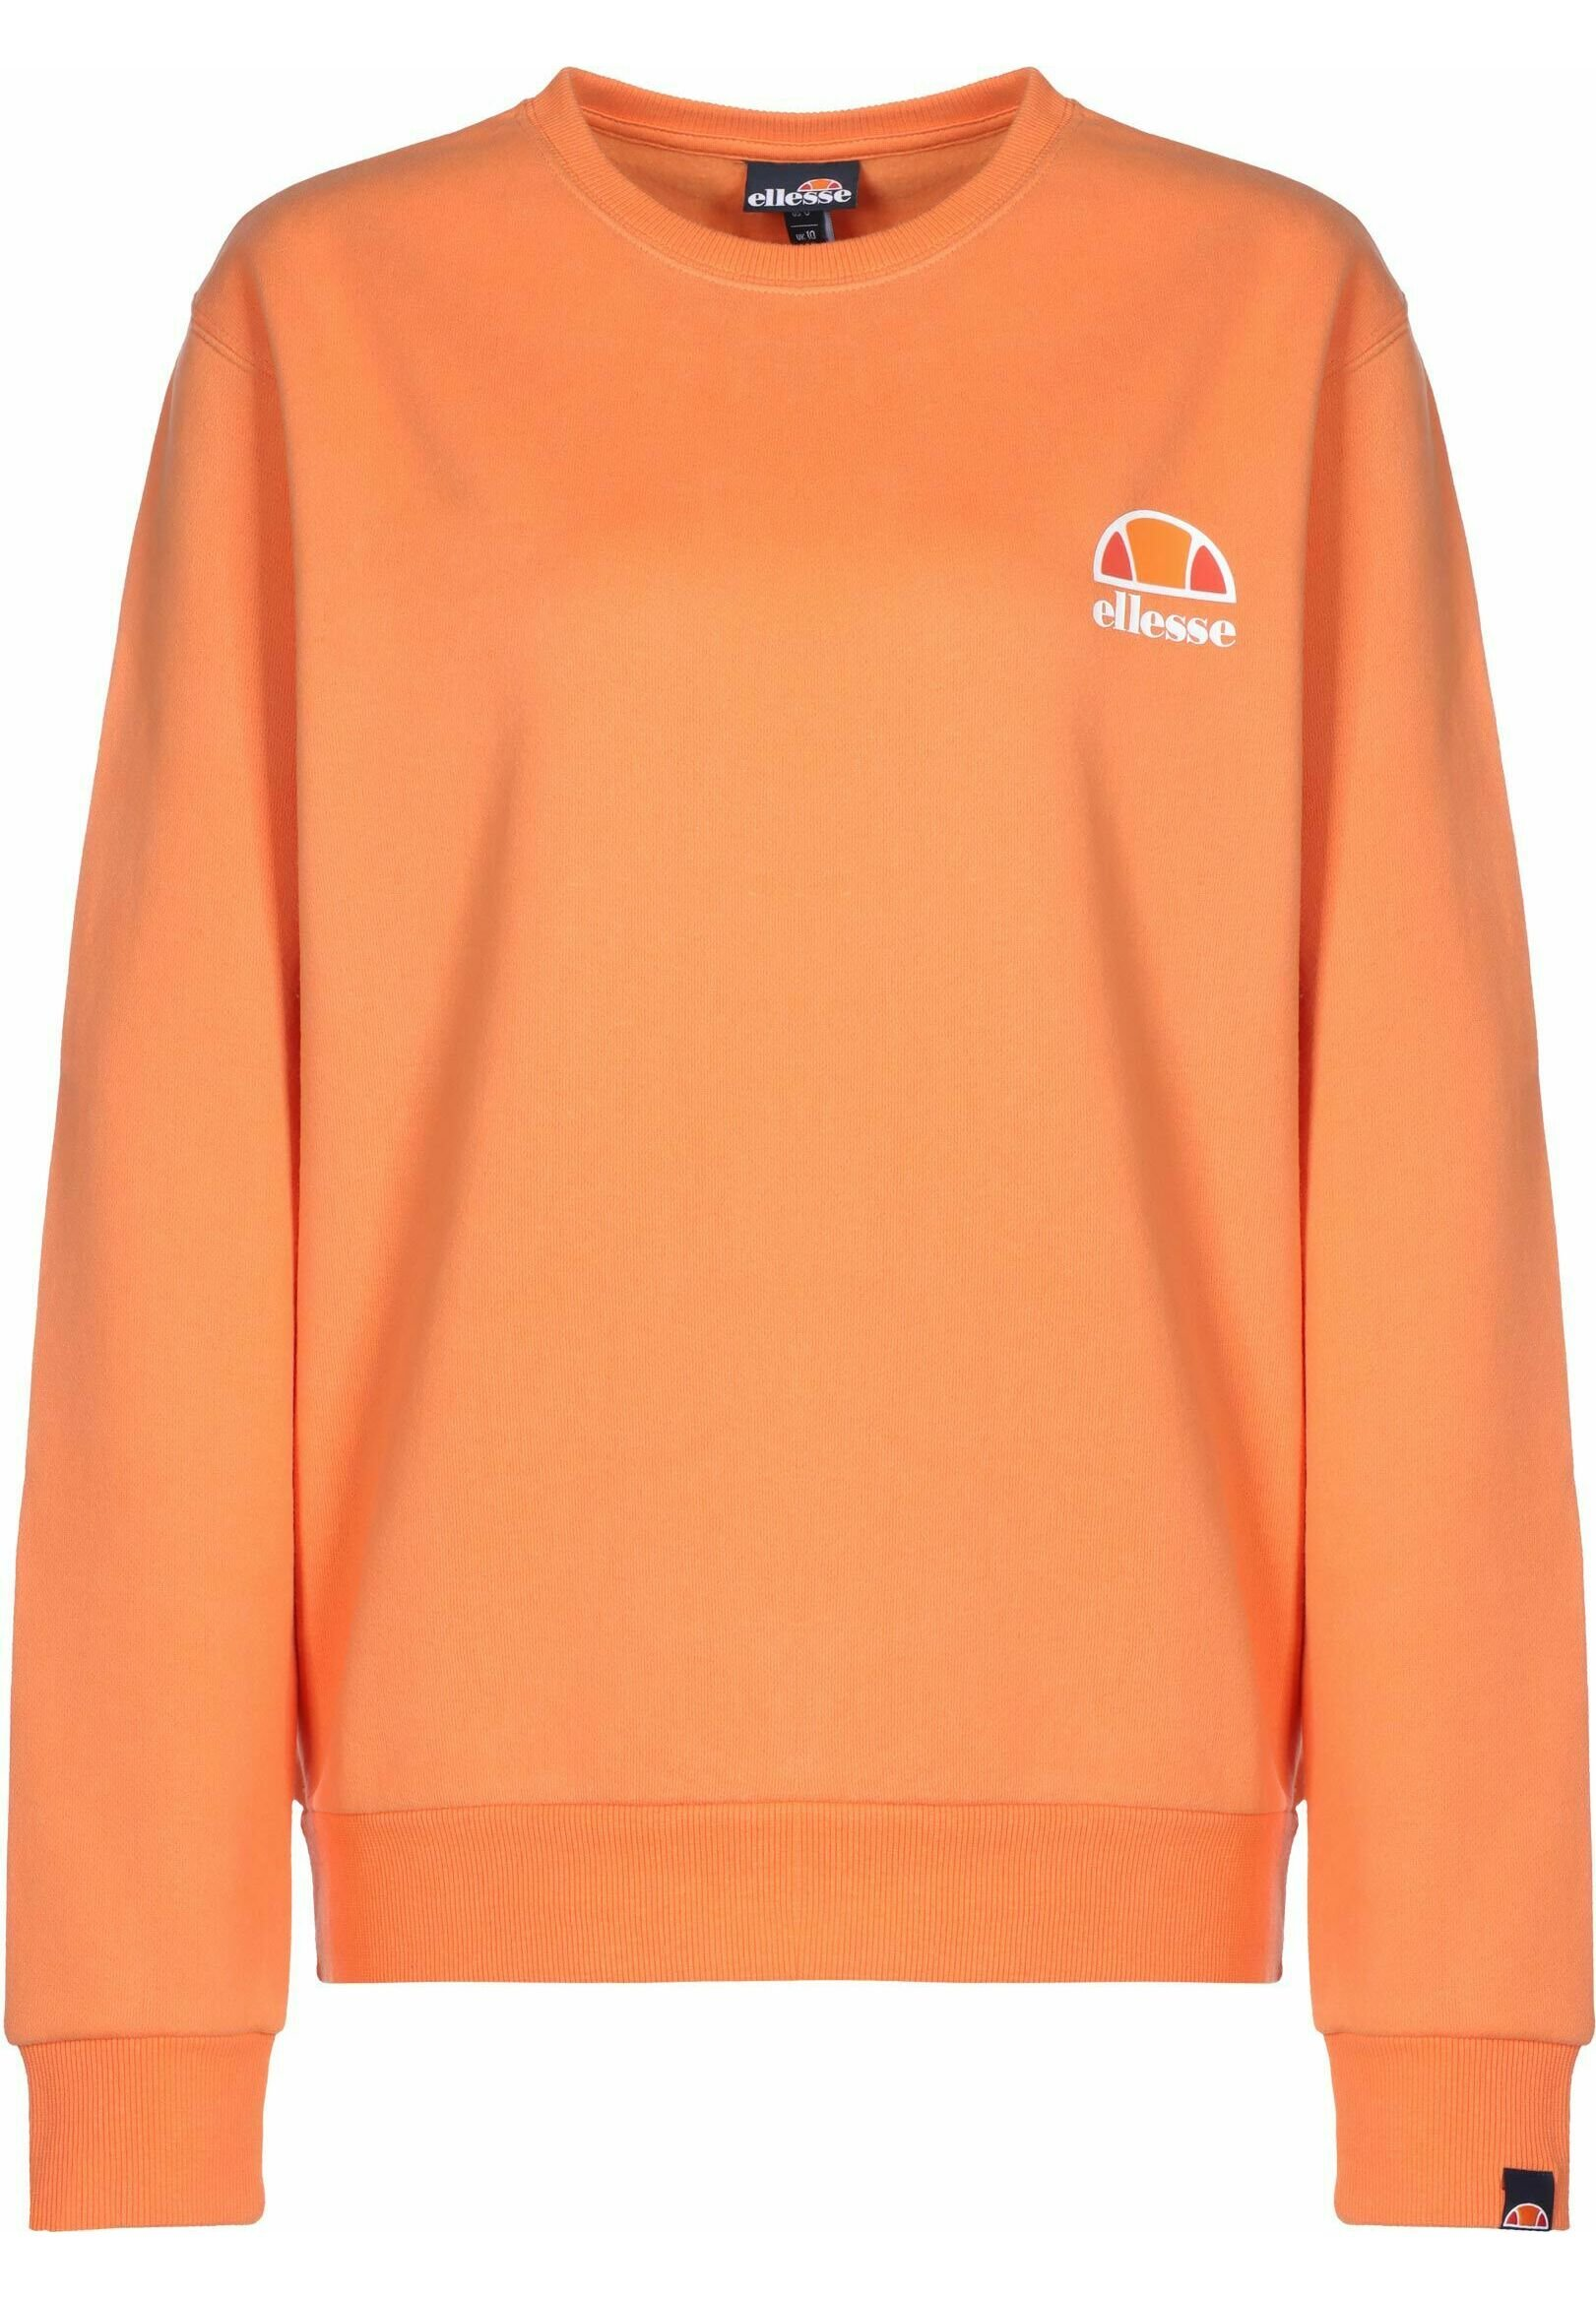 Femme HAVERFORD - Sweatshirt